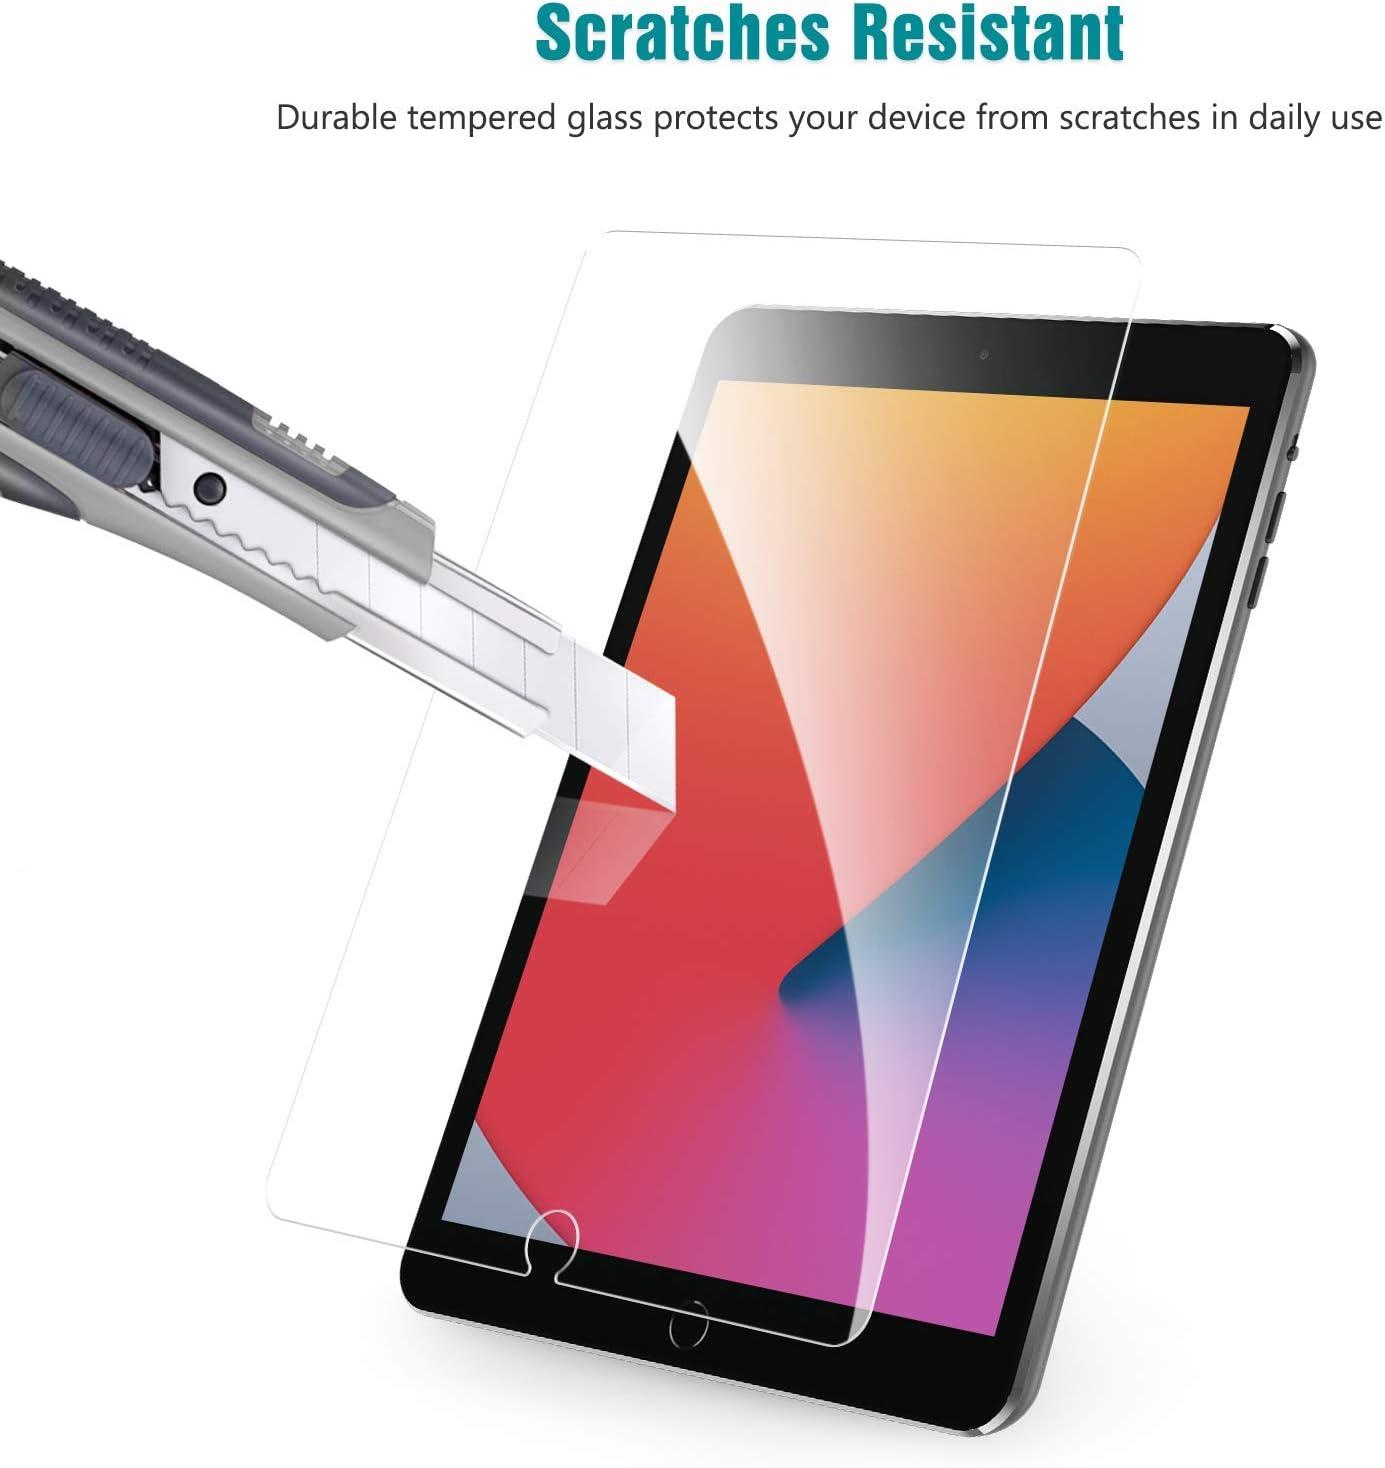 2 Piezas 2020//2019, 7/ª//8/ª Generaci/ón ,Cristal Templado iPad 8/ª Generaci/ón Anti-ara/ñazos KAPRNA Protector Pantalla Compatible con iPad 10.2 Pulgadas